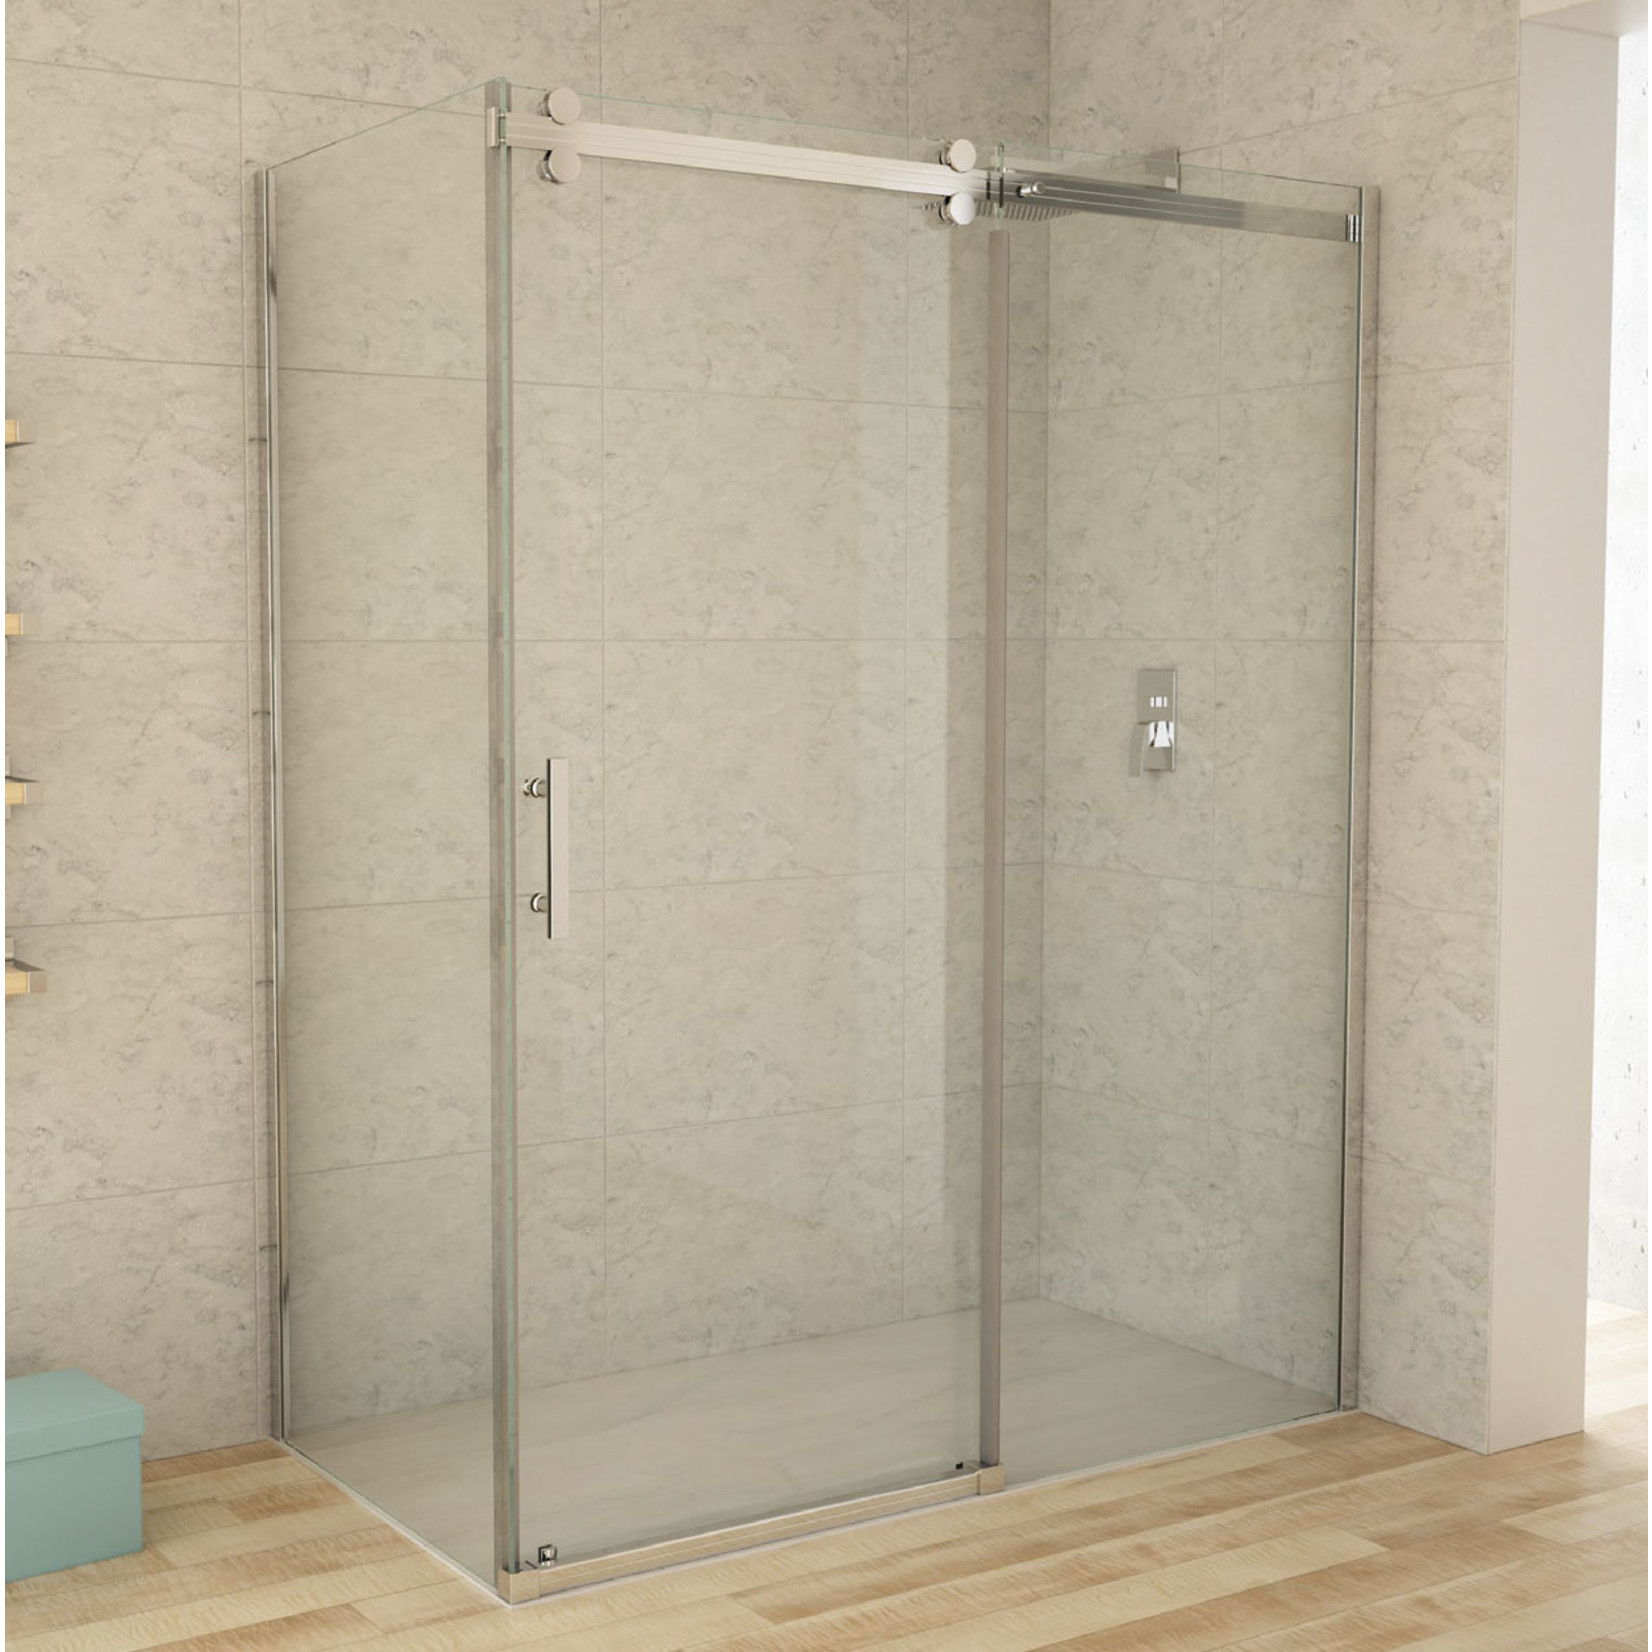 Reversible chrome shower set 36x48 CDC